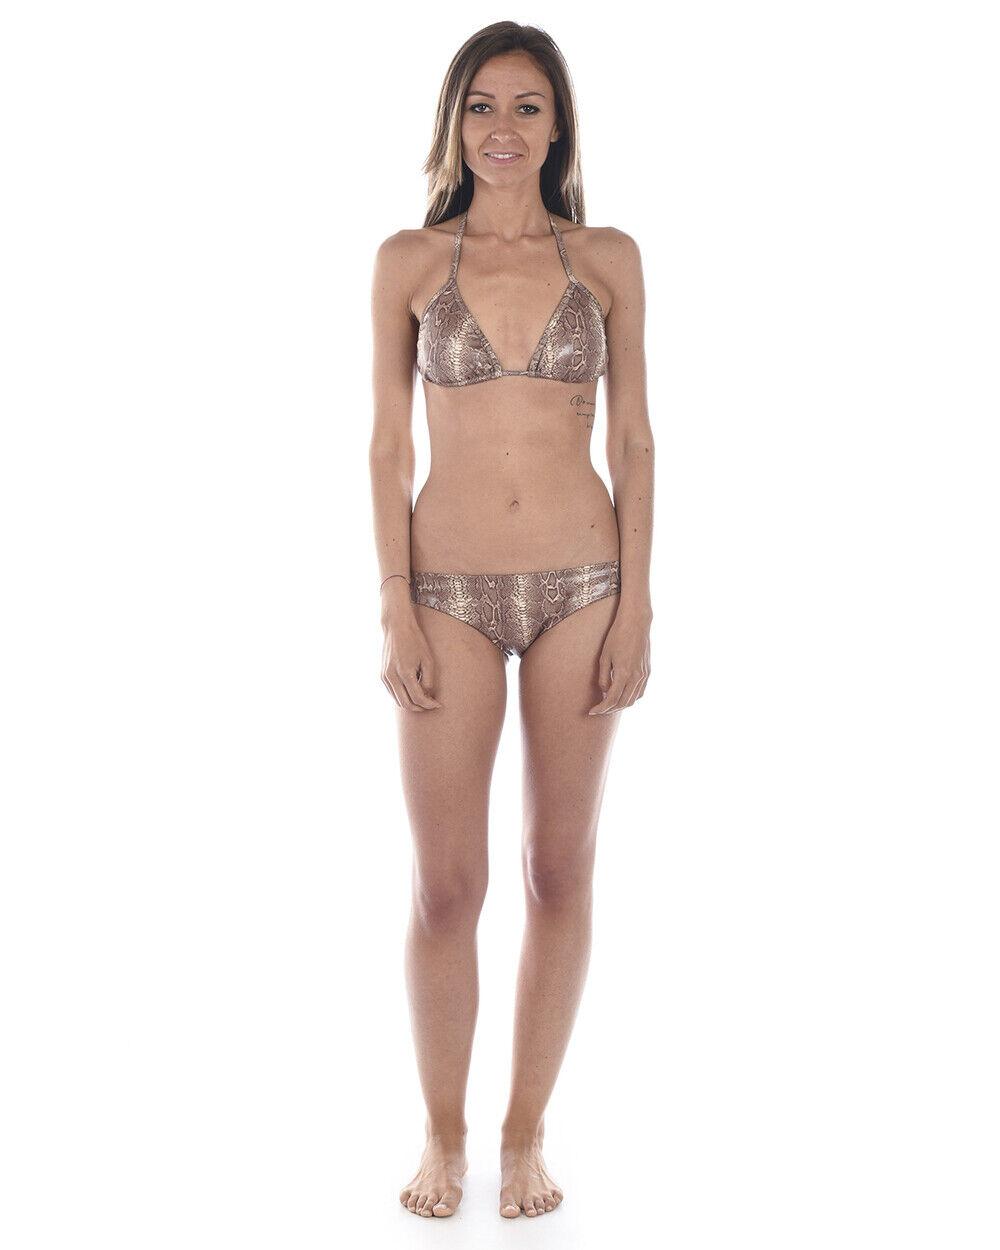 Bikini Biki Branz Bikini Réglable ITALY Femme Marron 439 TL. M_L FAIRE OFFRE